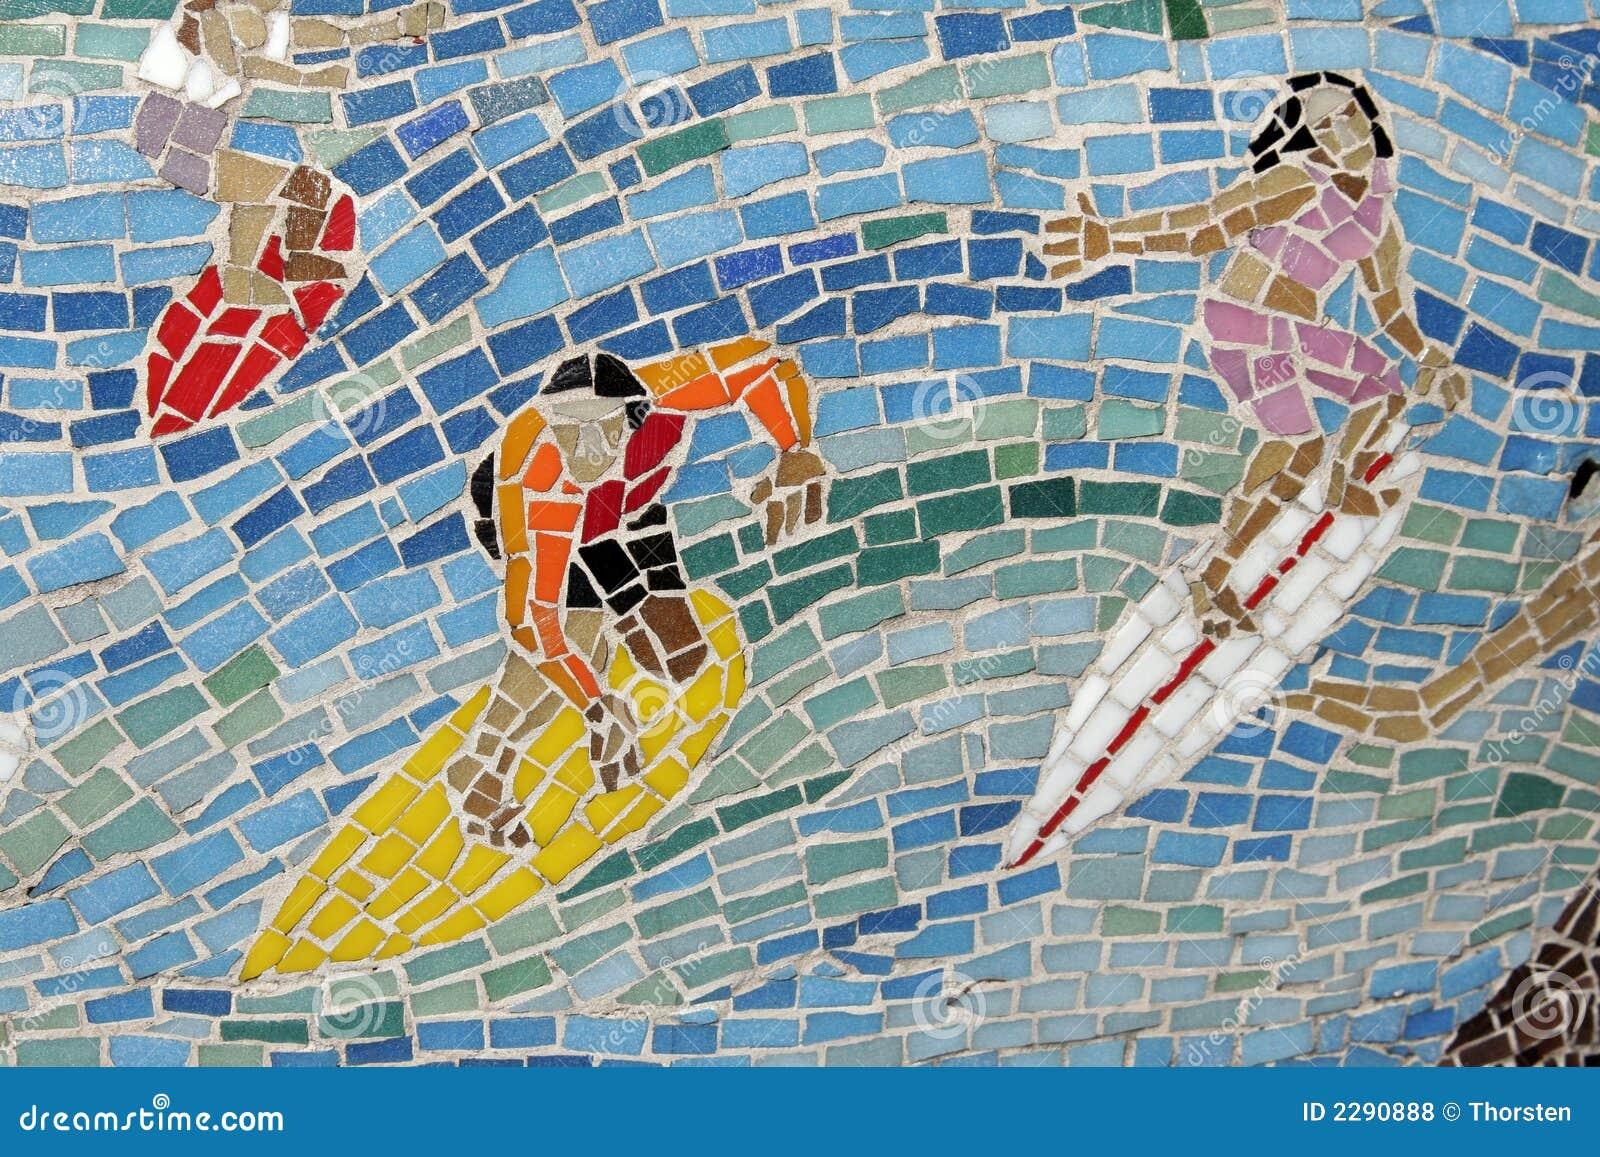 Mosaic Surfer, Background